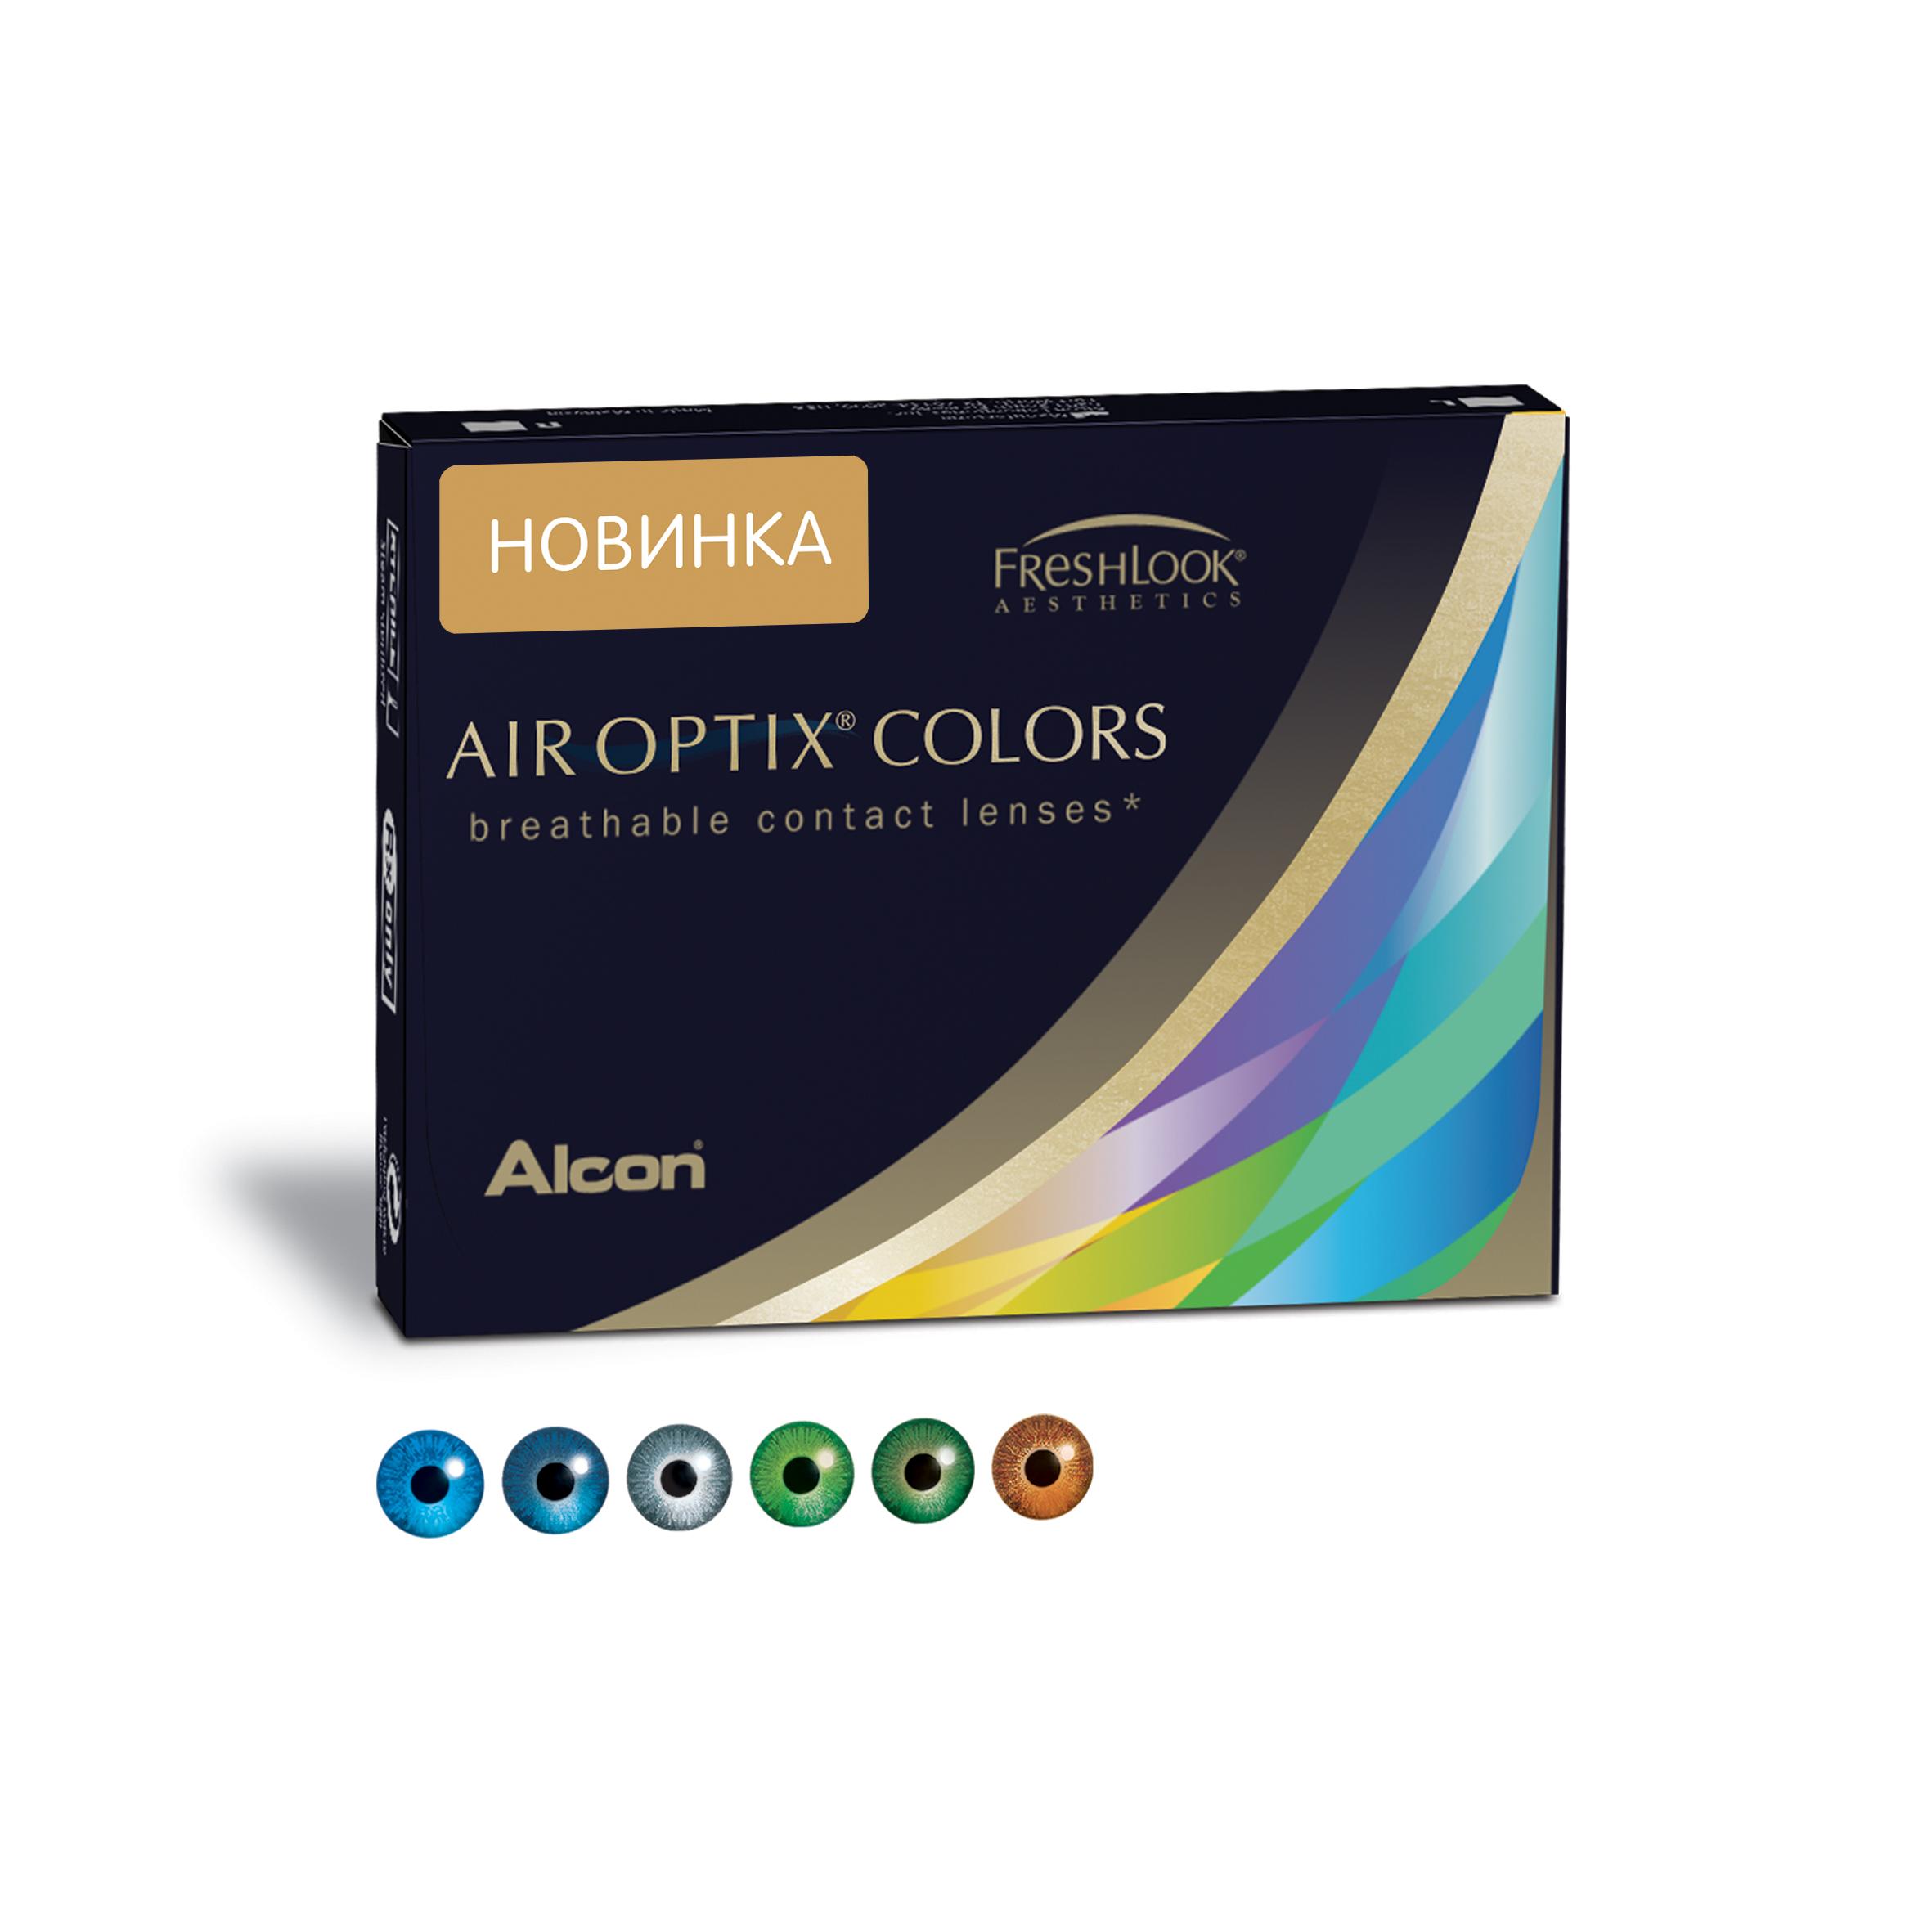 Аlcon контактные линзы Air Optix Colors 2 шт -2.00 Blue ( 31746157 )